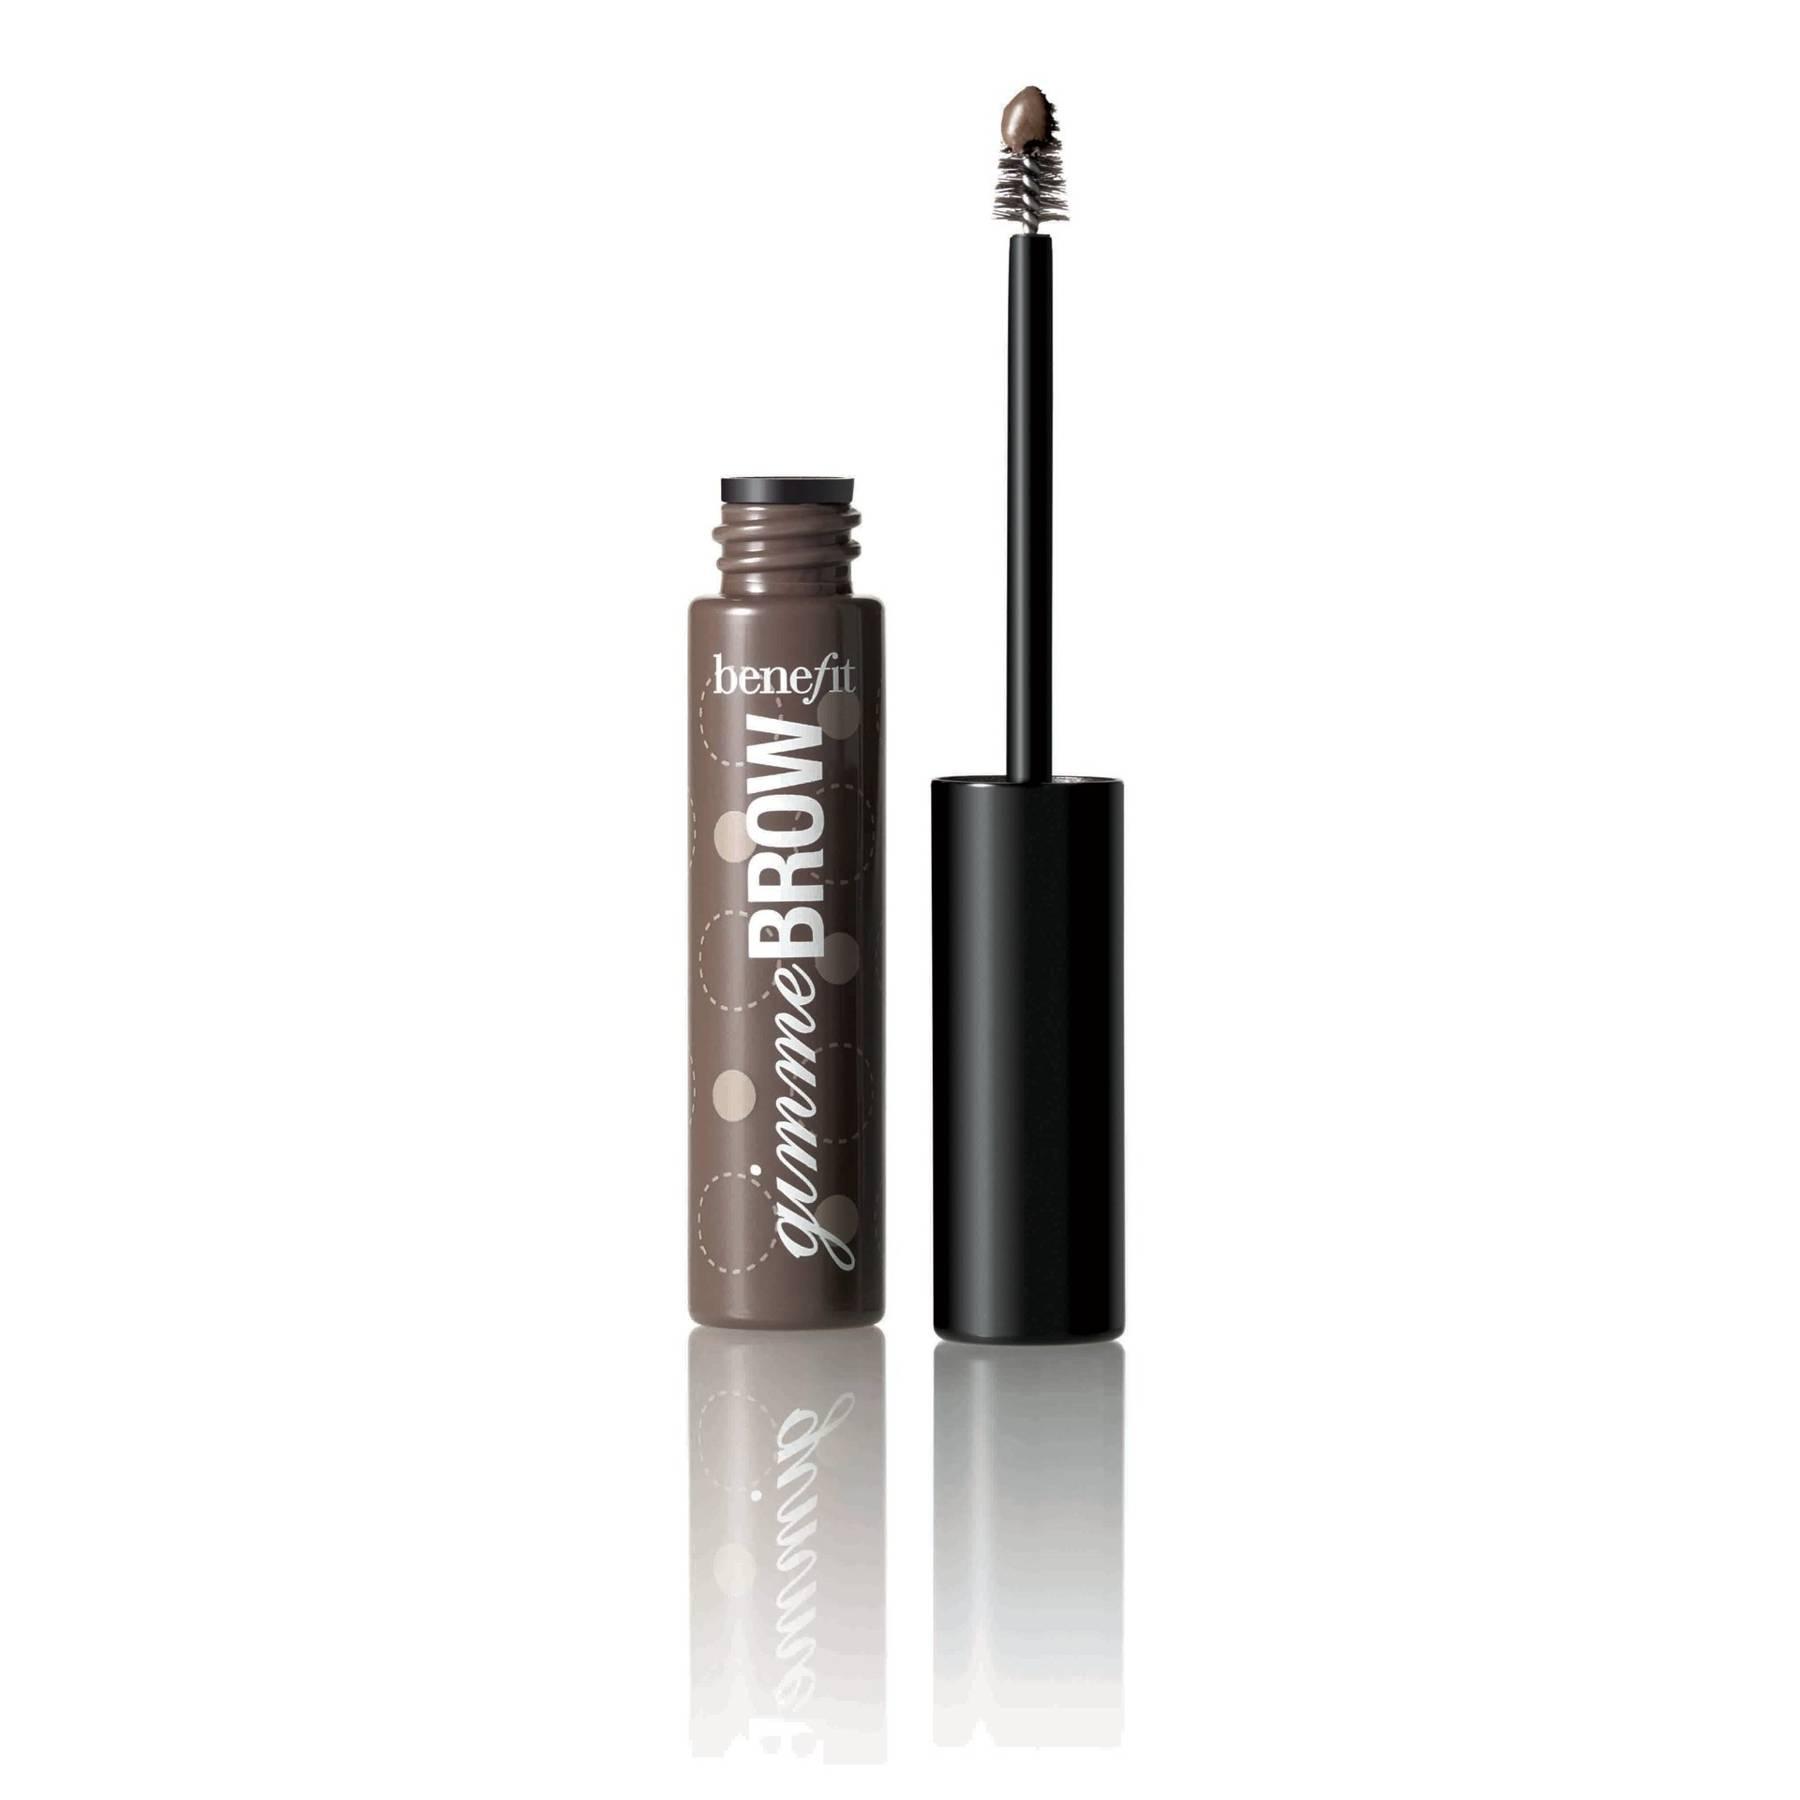 Best Eyebrow Products Top Eyebrow Pencils Brow Kits Gels